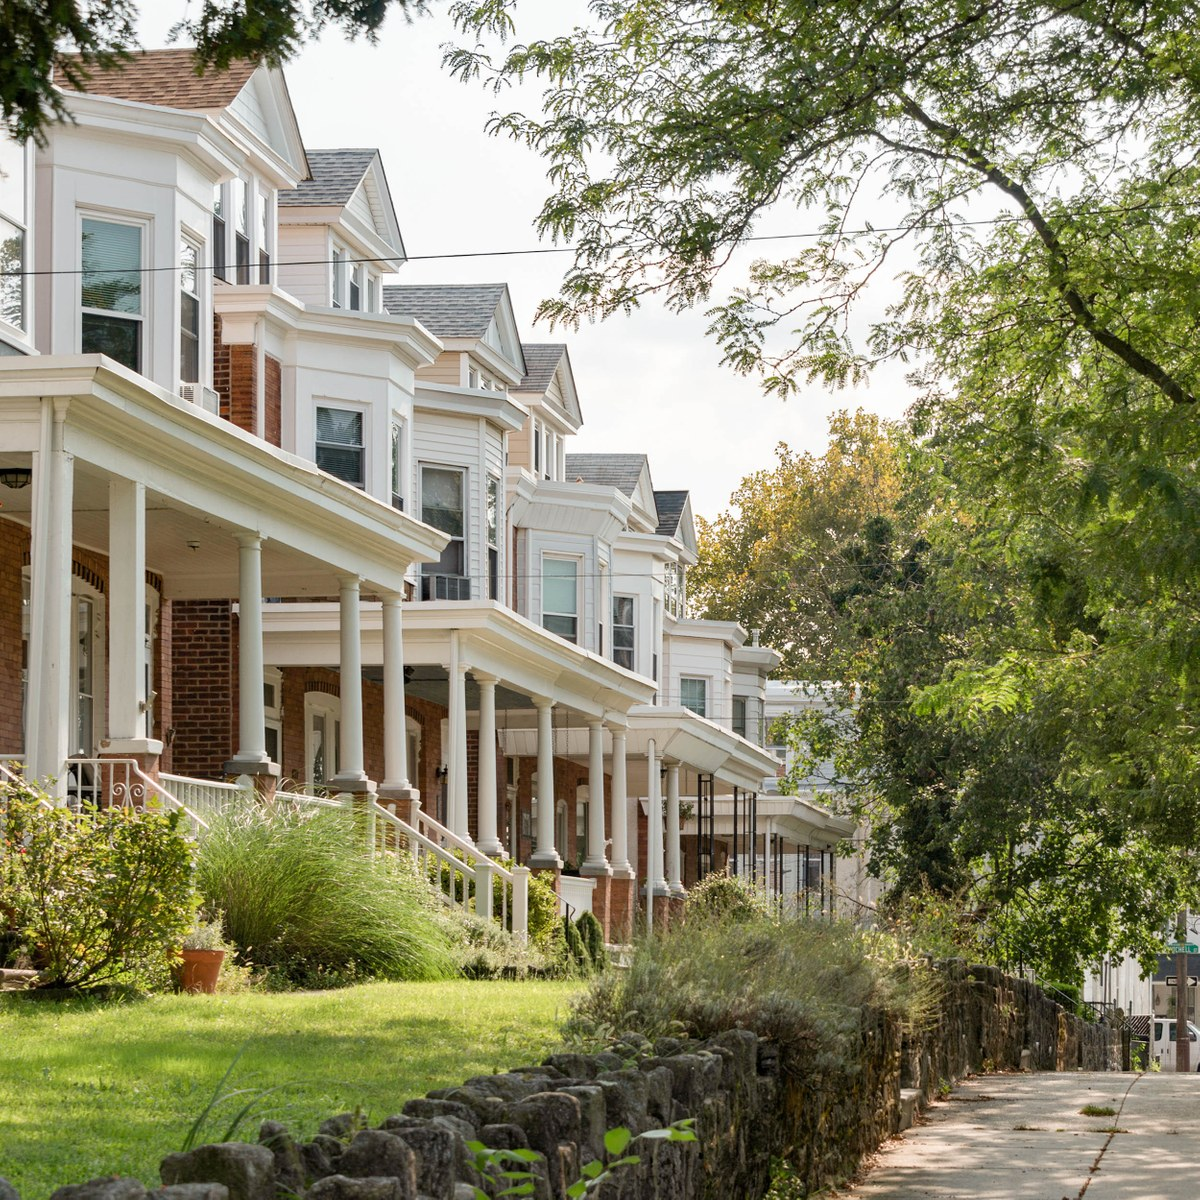 Roxborough, Philadelphia PA - Neighborhood Guide